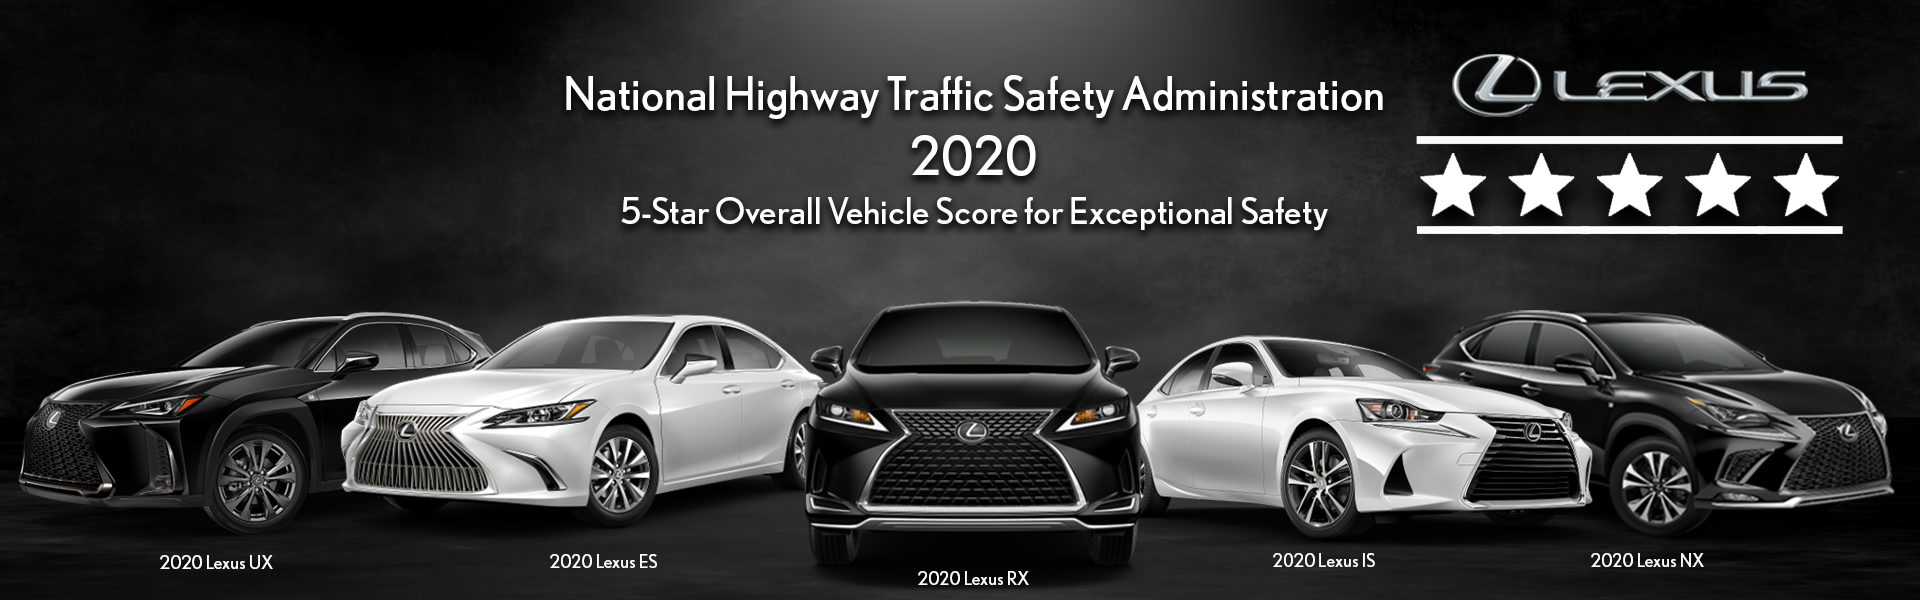 NHTSA Five Star Safety 2020